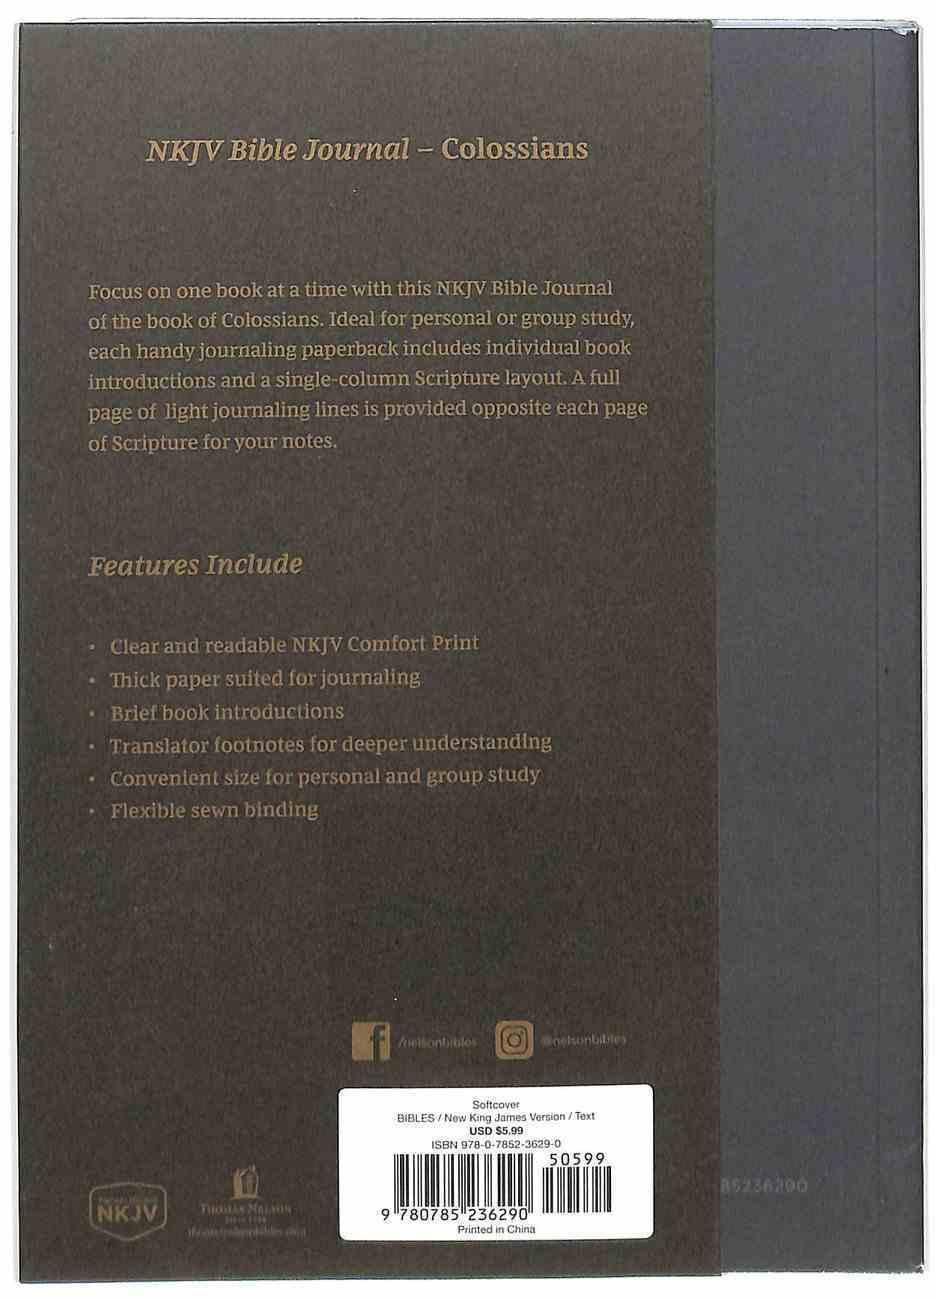 NKJV Bible Journal - Colossians Paperback